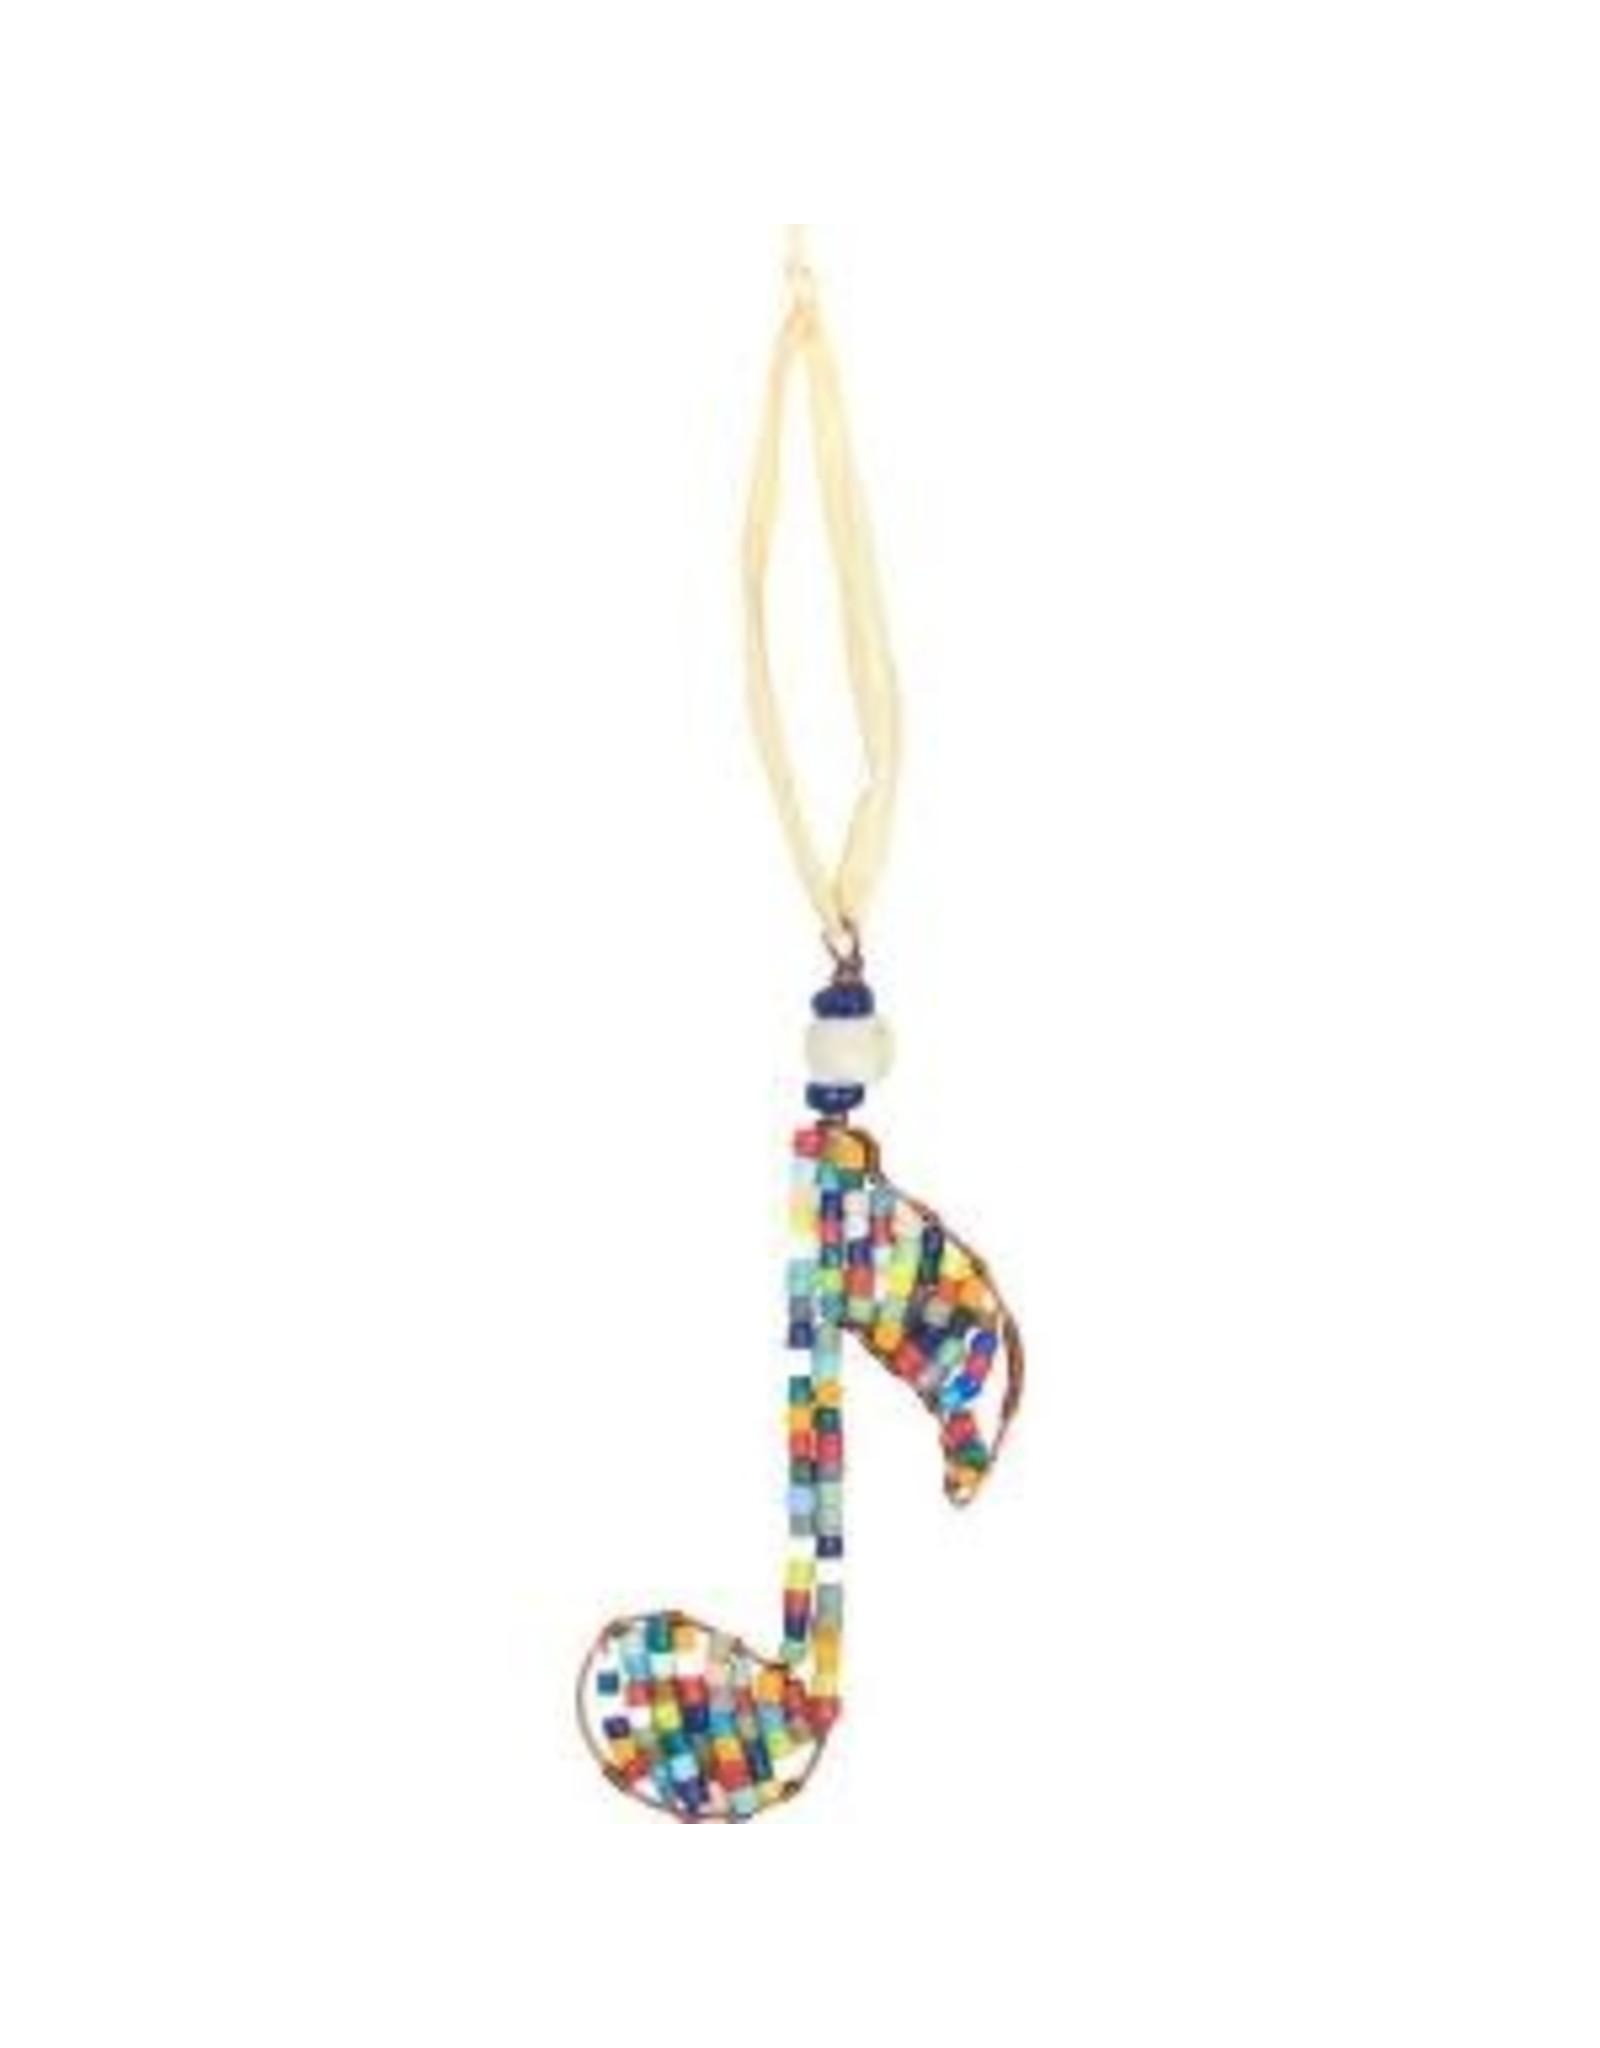 Beaded Musical Note Ornament, Ghana